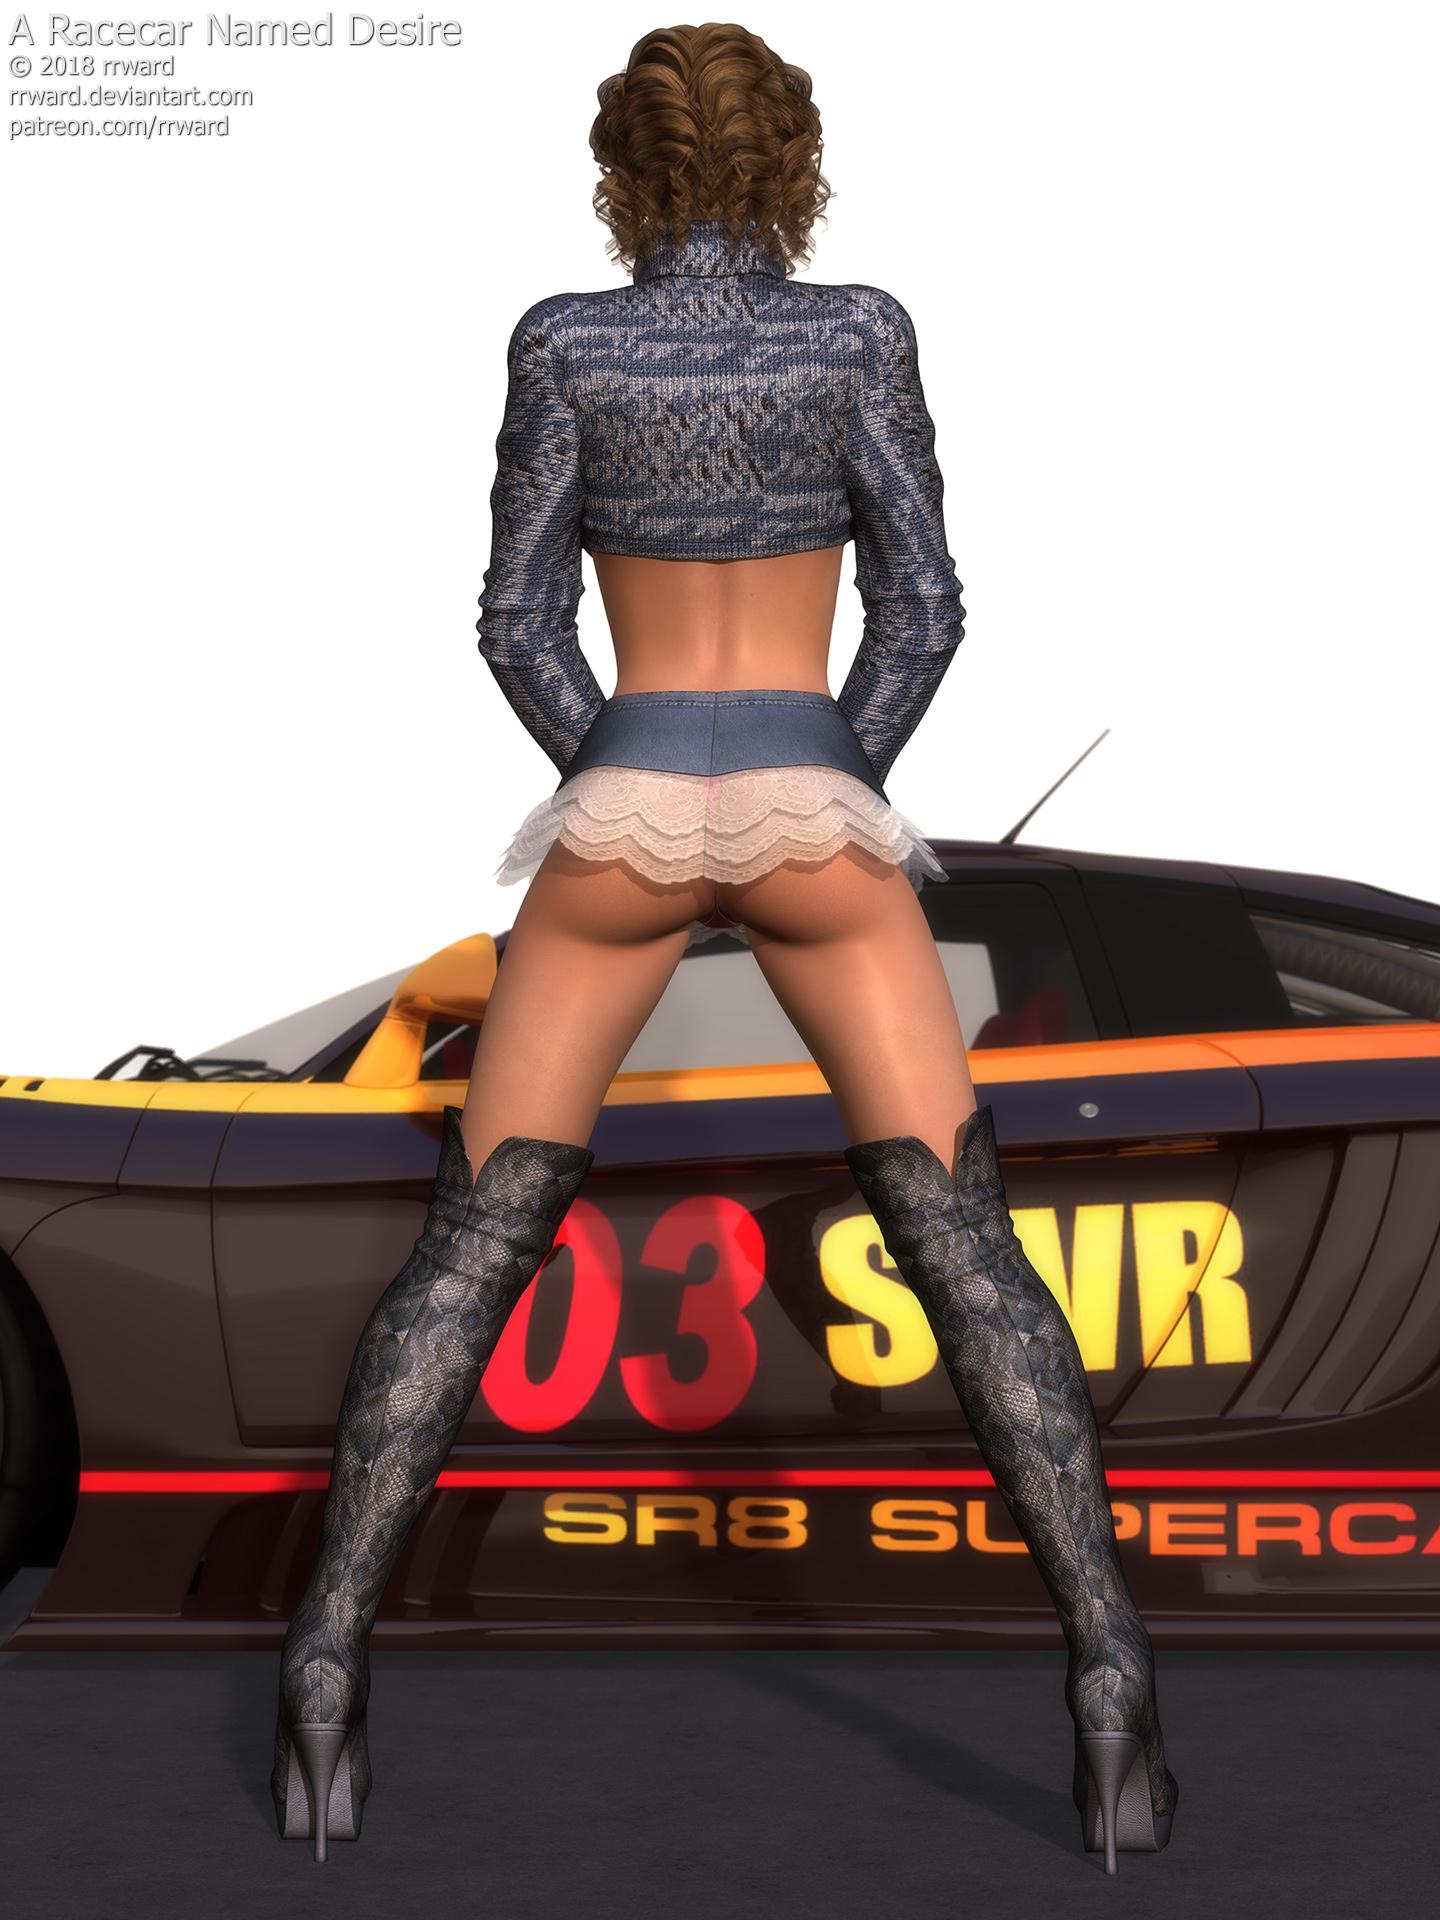 A Racecar Named Desire by rrward